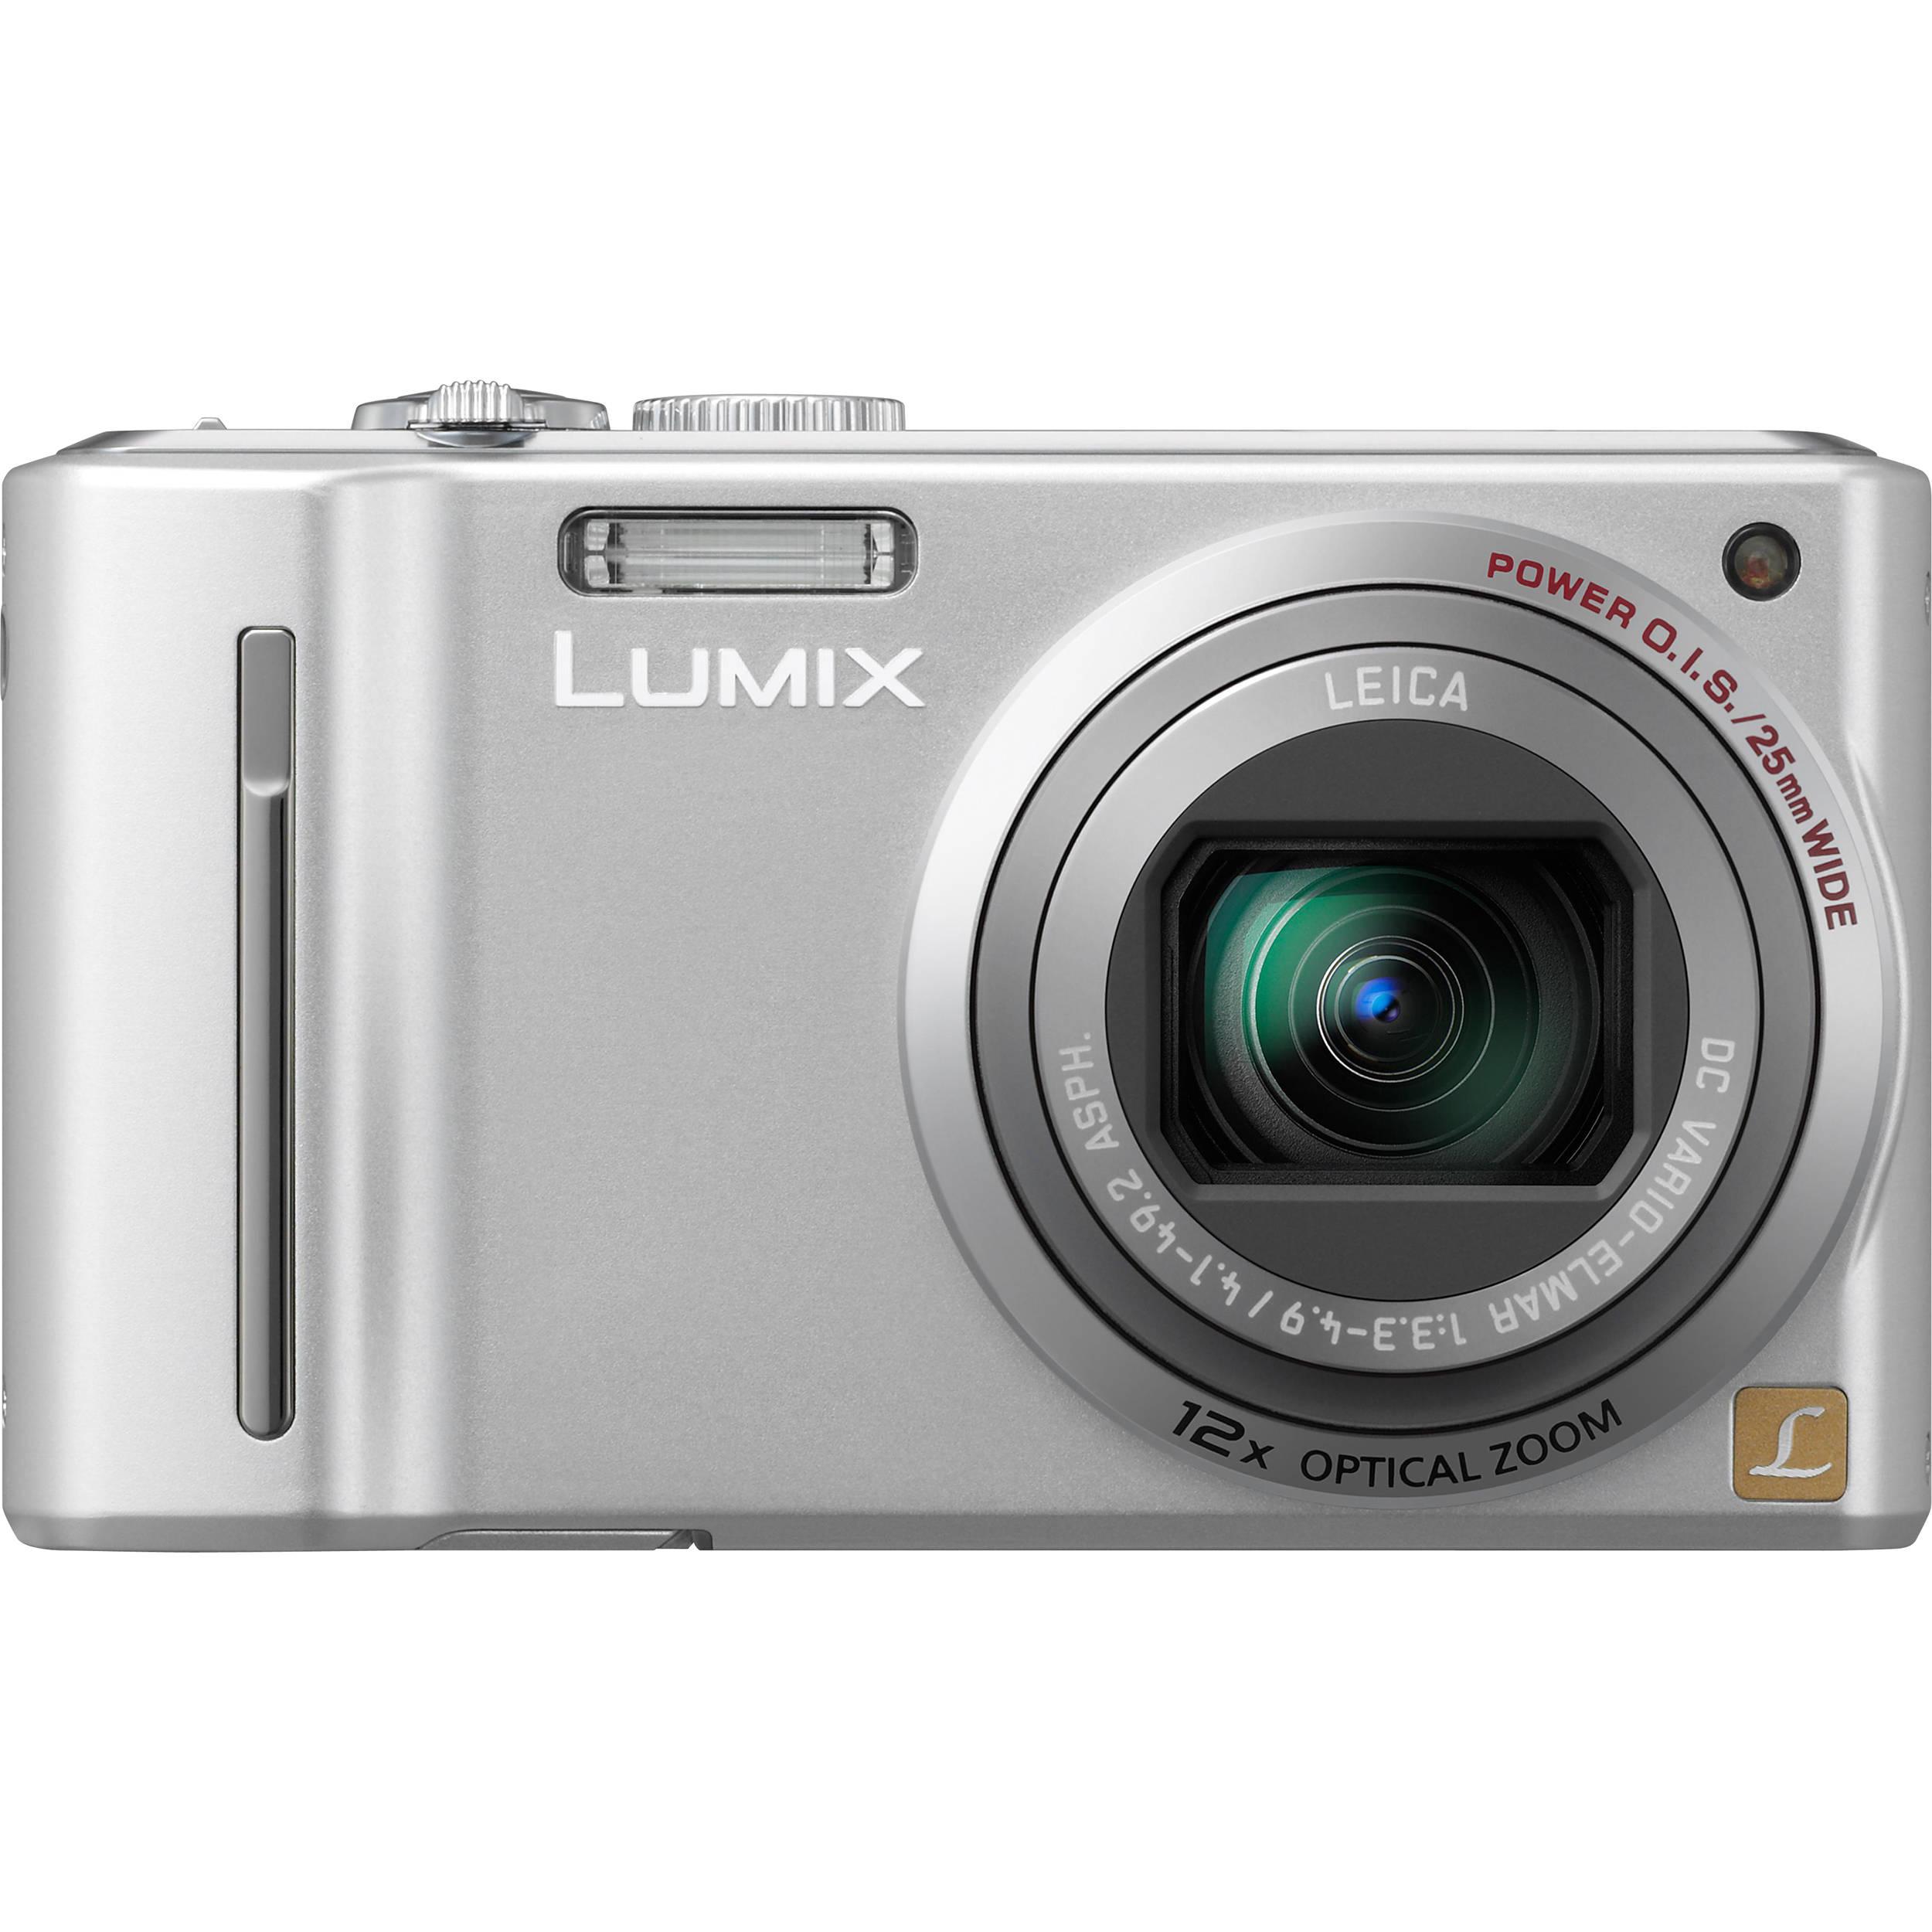 panasonic lumix dmc zs5 digital camera silver dmc zs5s b h rh bhphotovideo com 24X Panasonic Lumix DMC Panasonic Lumix DMC Camera